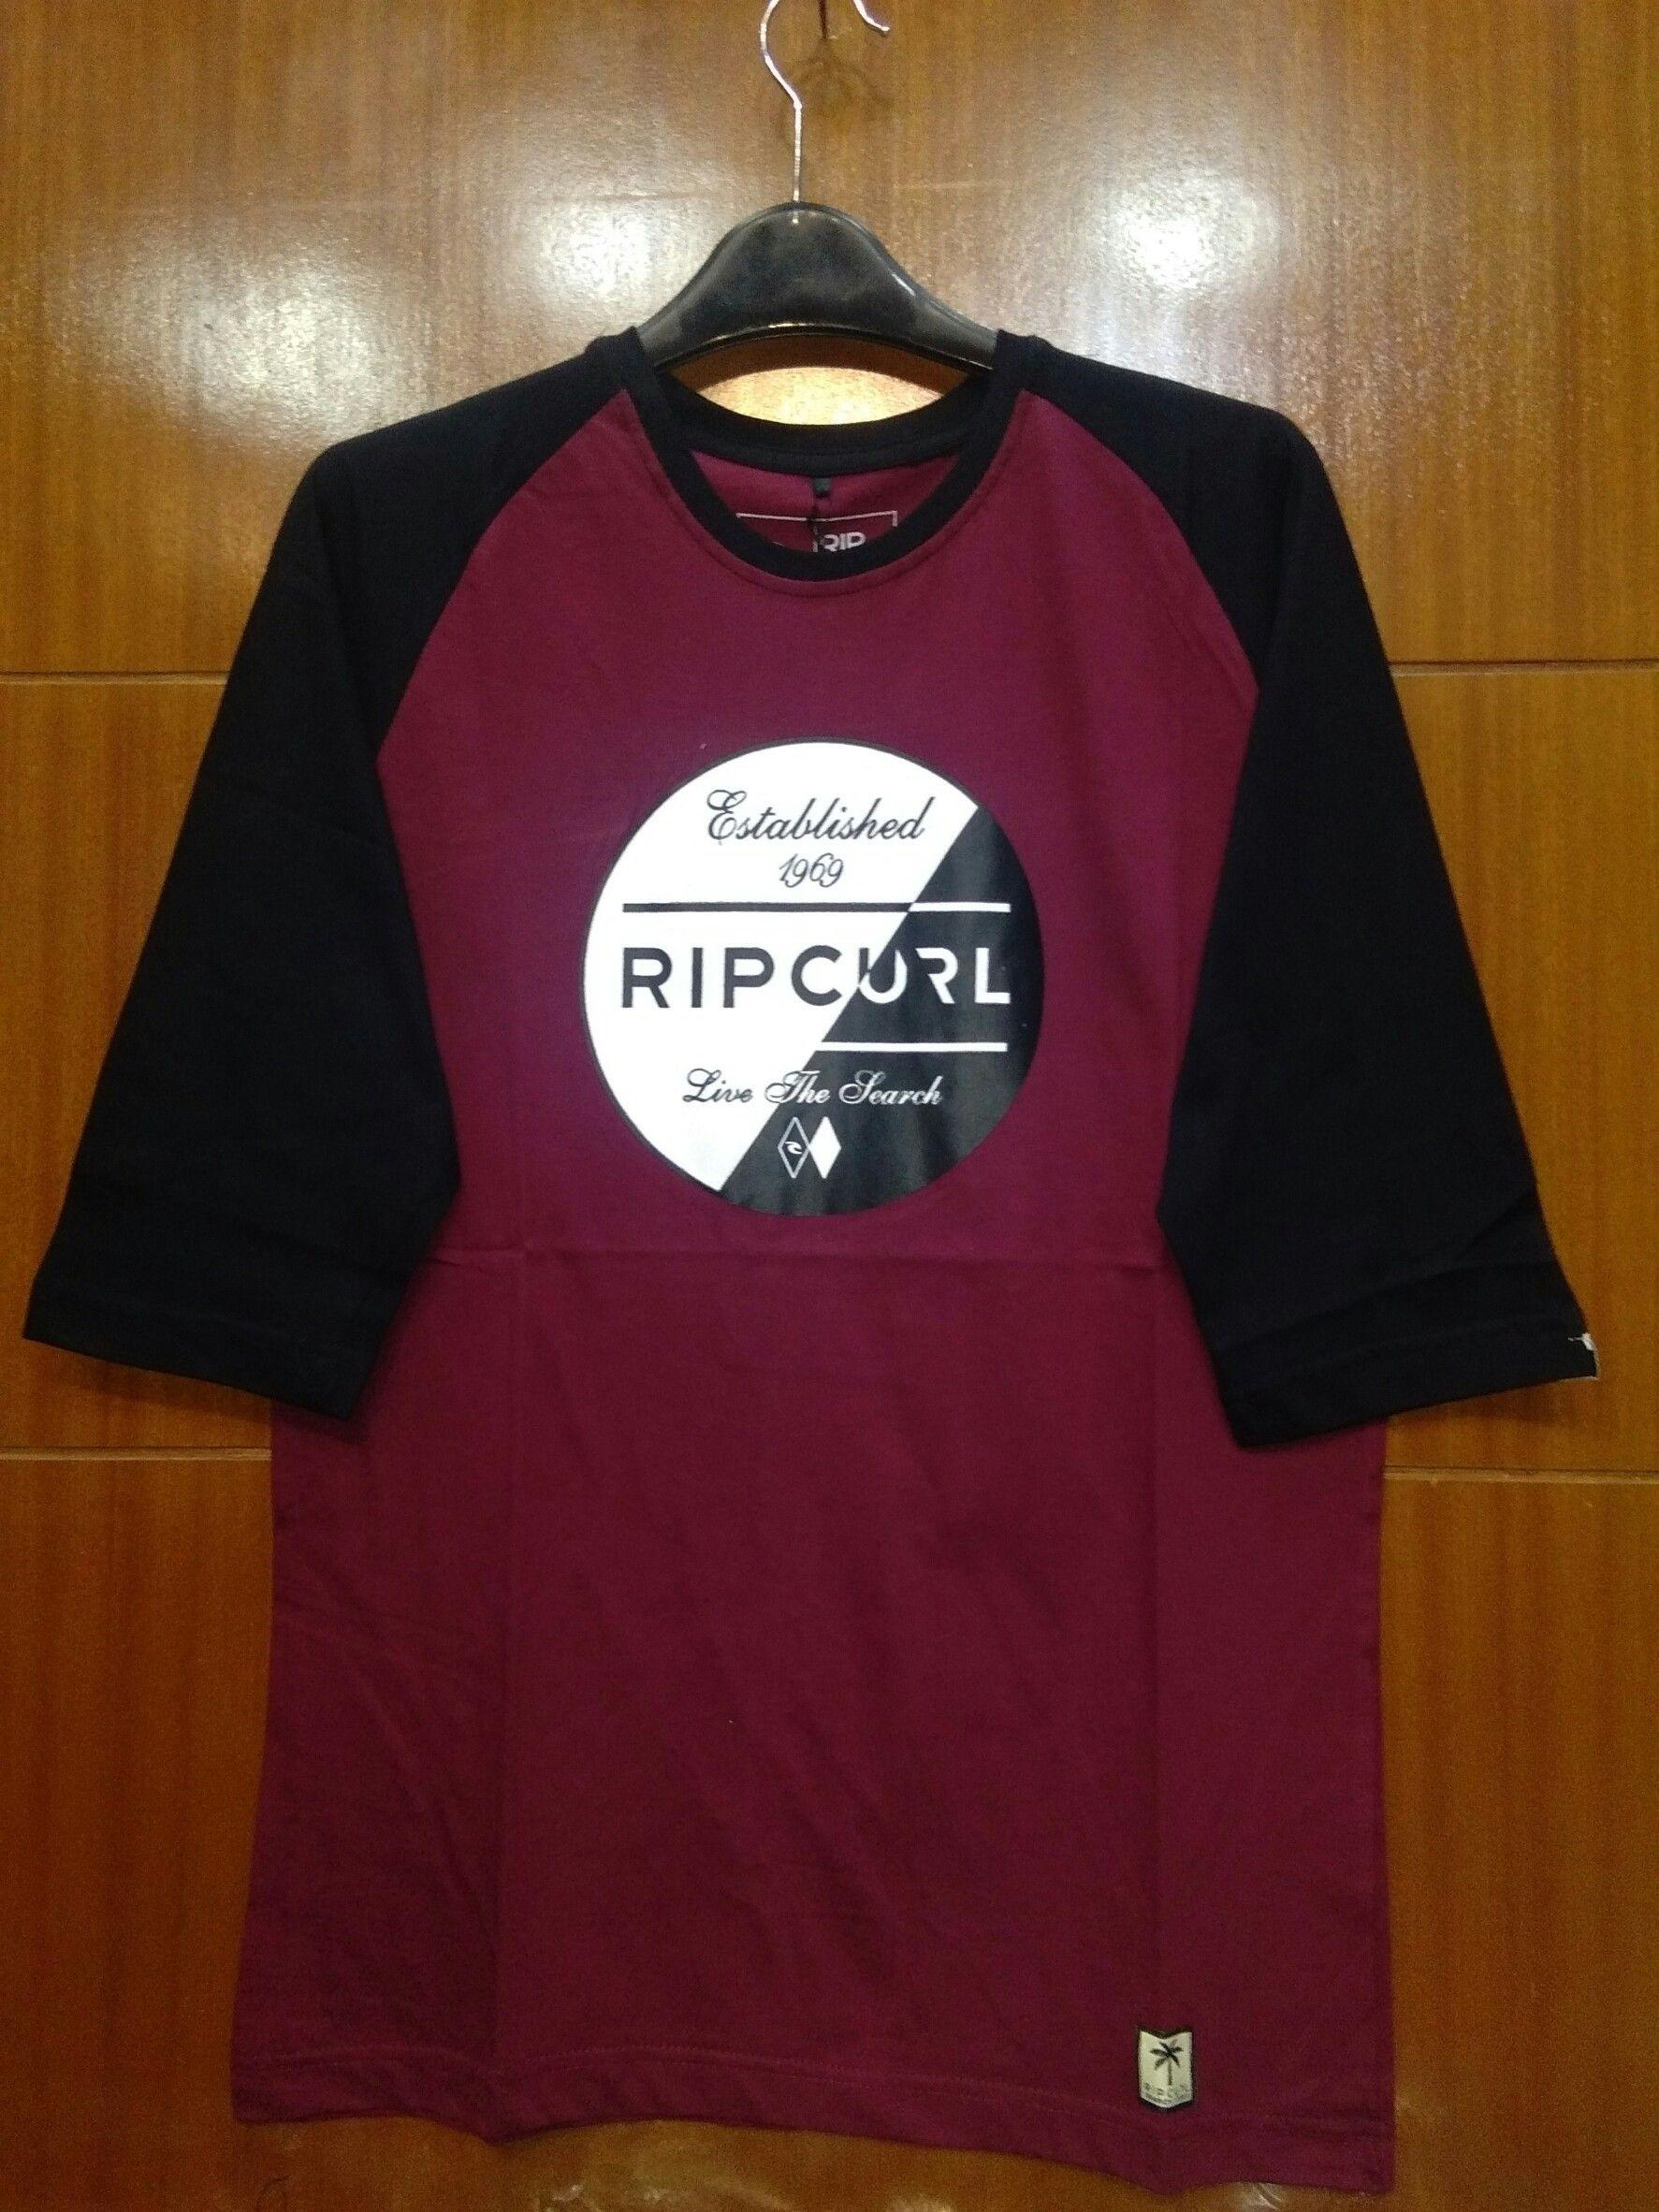 Kaos Raglan Lengan Panjang 3 4 Terbaru Ageragrosirdistrocom Tendencies Pocket Tshirt Logo Misty Red Merah M Pinterest